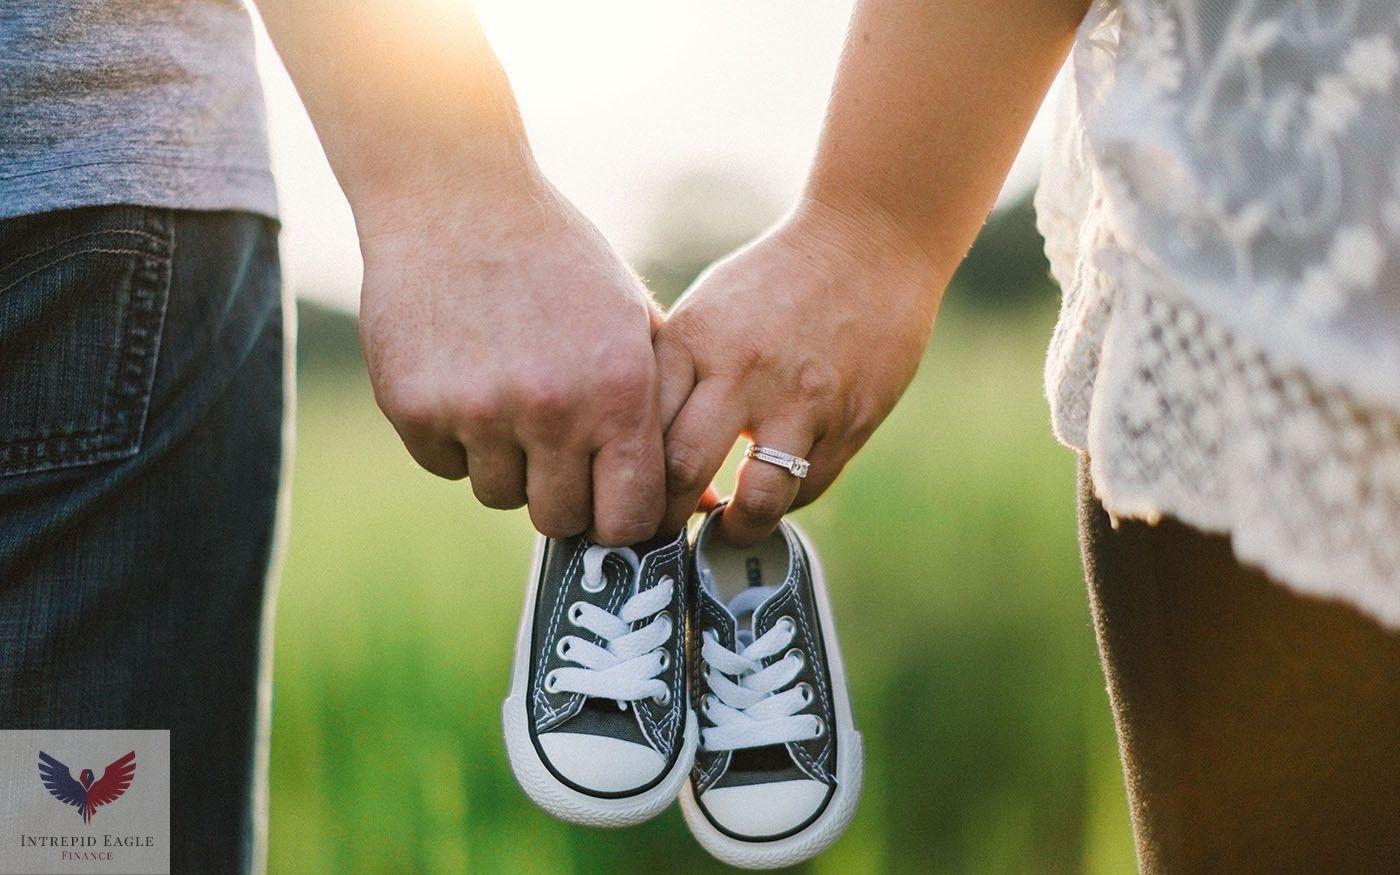 Expecting a Baby? 4 Life Insurance Tips Thumbnail